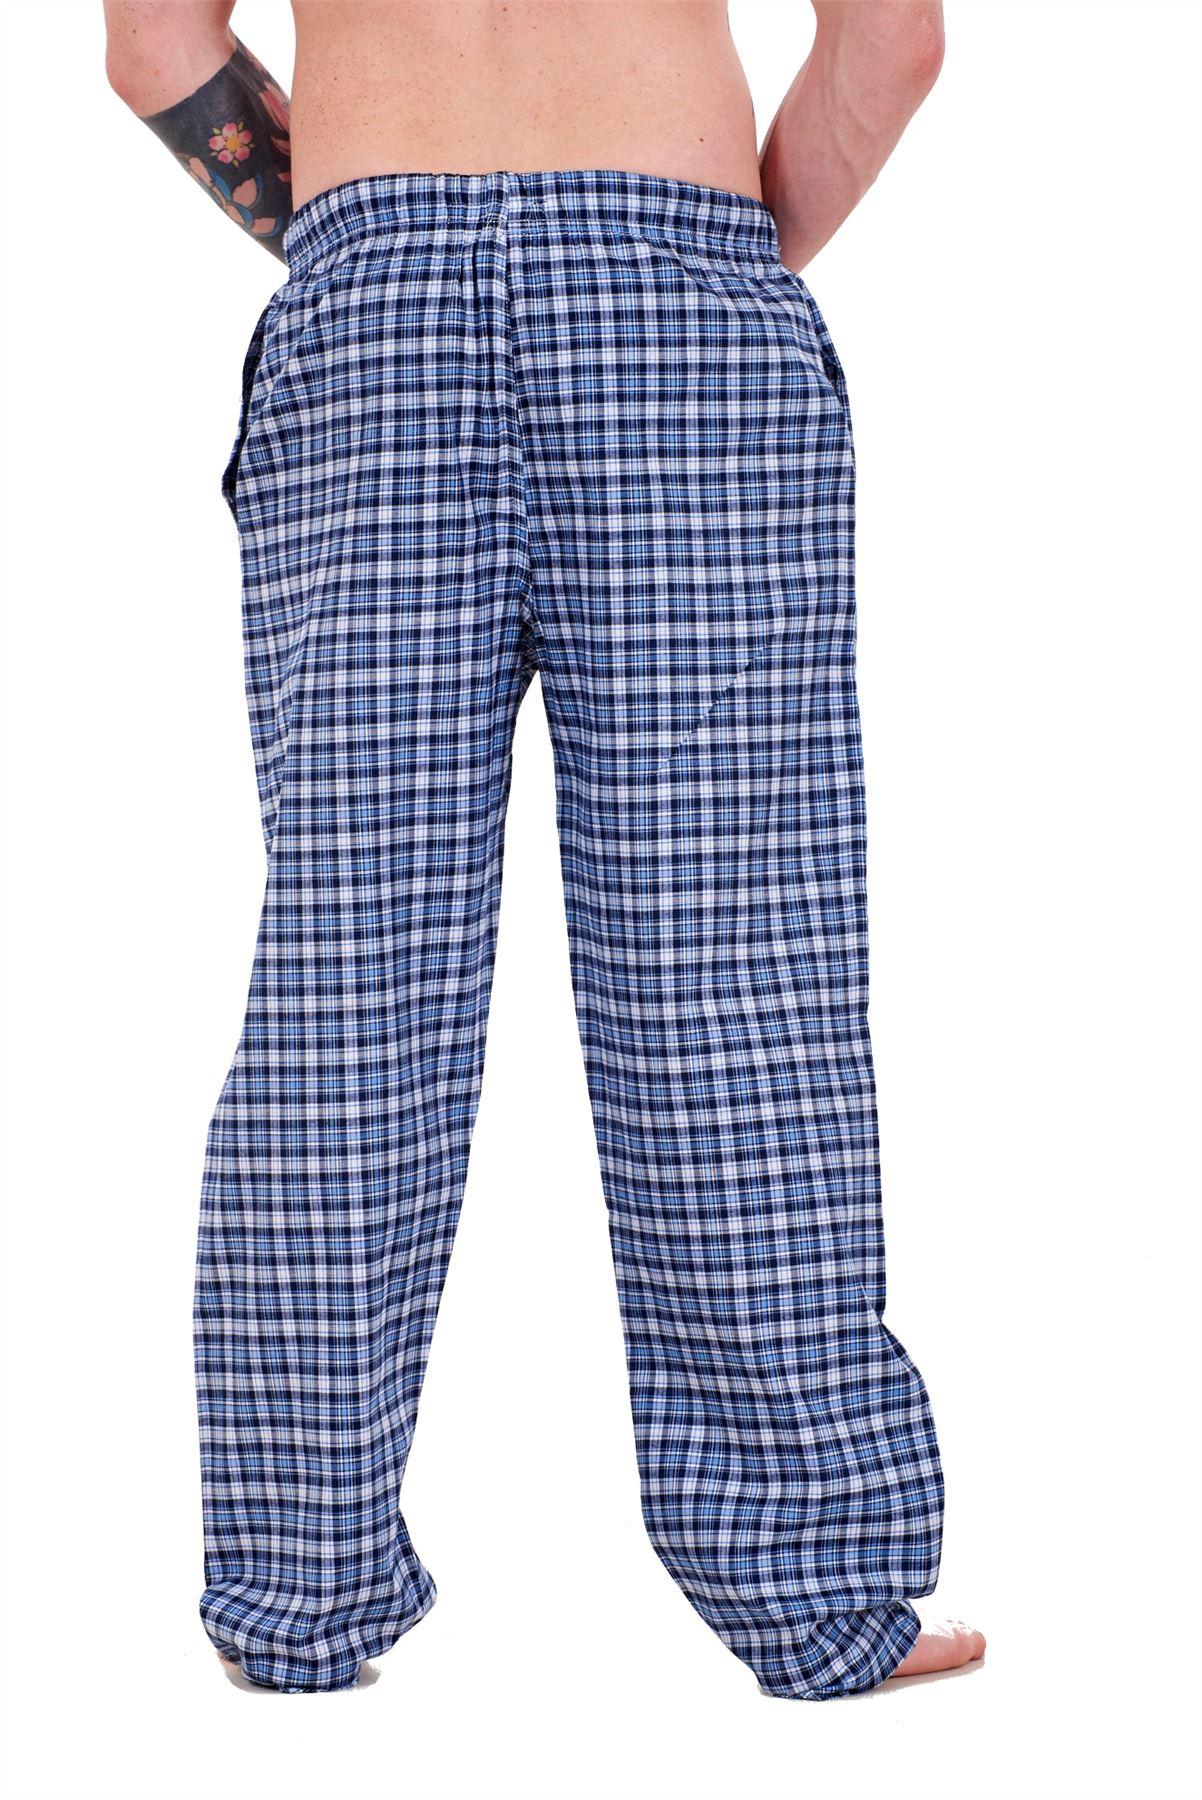 Mens-Pyjama-Bottoms-Rich-Cotton-Woven-Check-Lounge-Pant-Nightwear-Big-3XL-to-5XL Indexbild 13